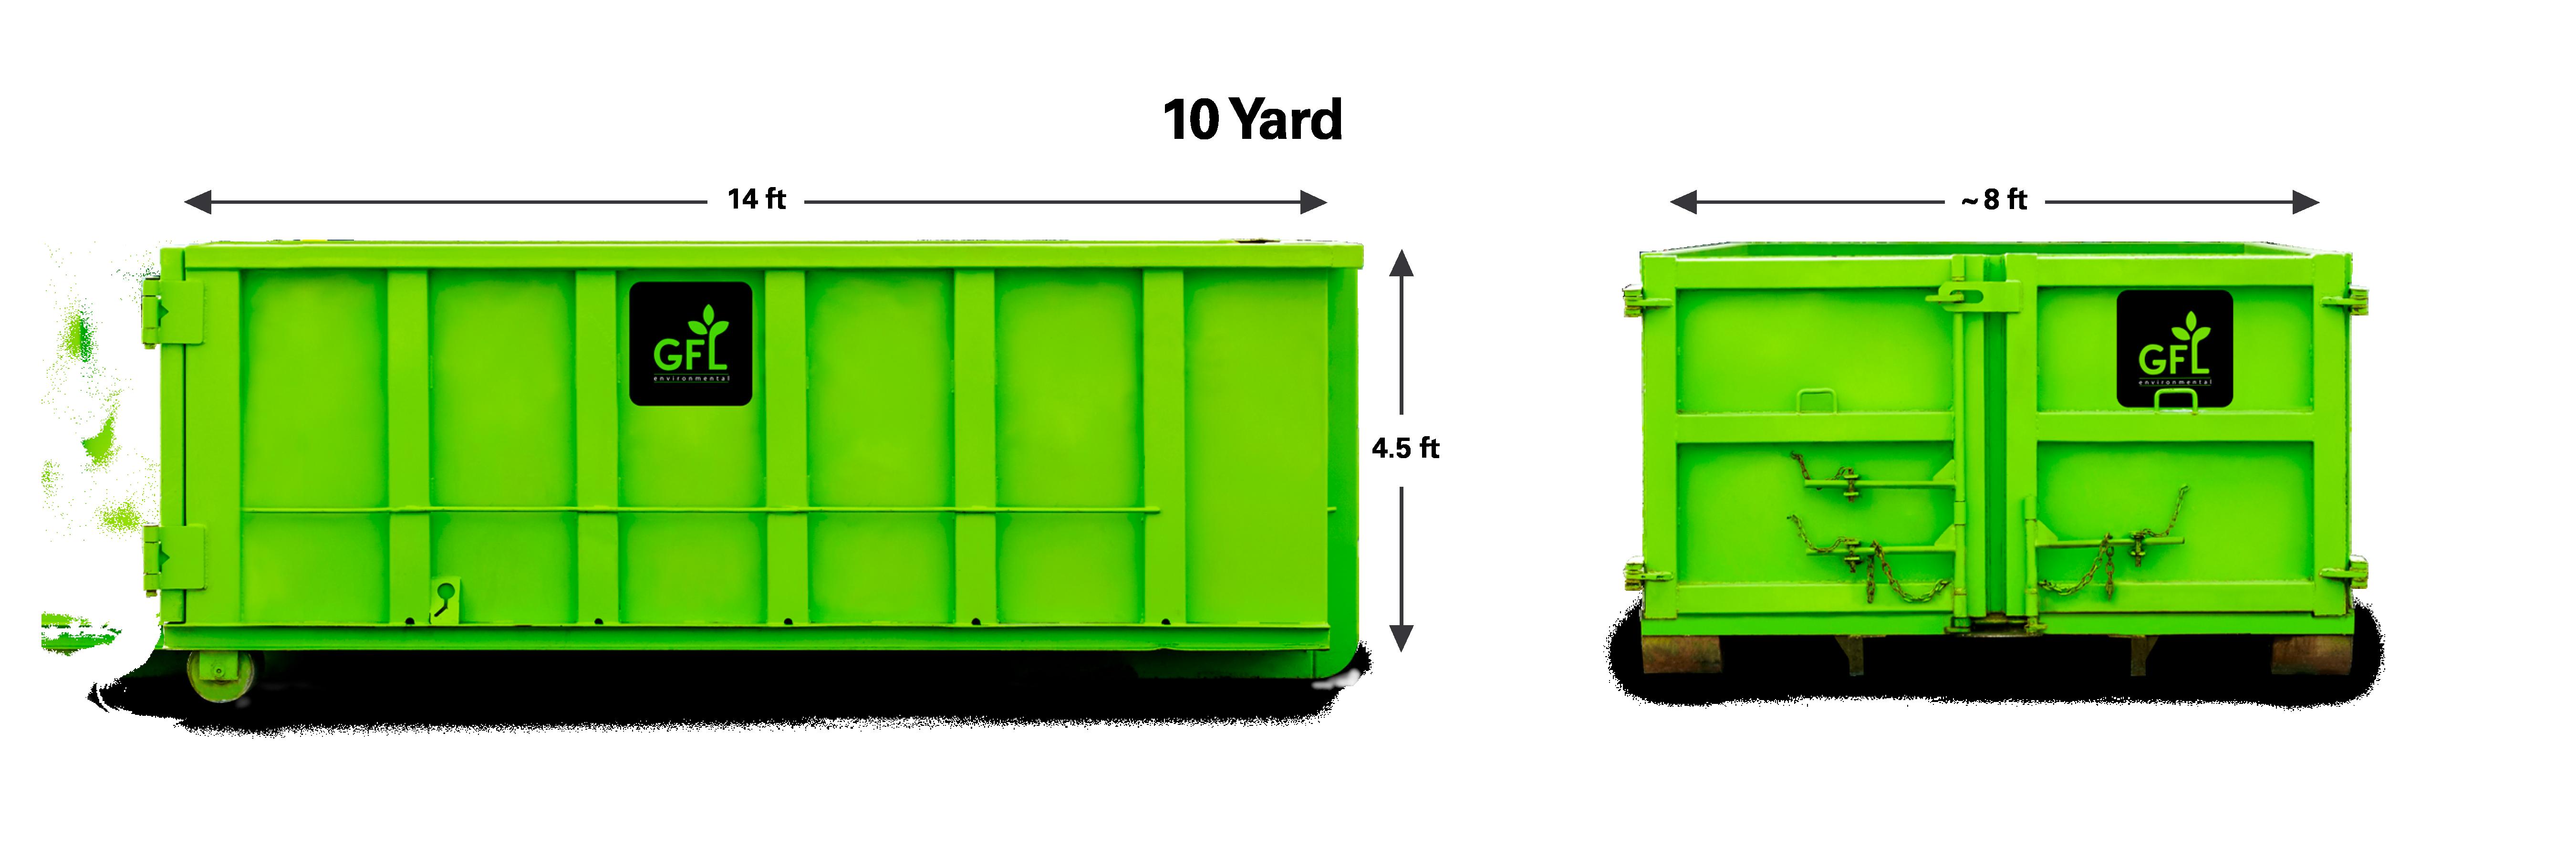 10-Yard Roll-off Dumpster from GFL